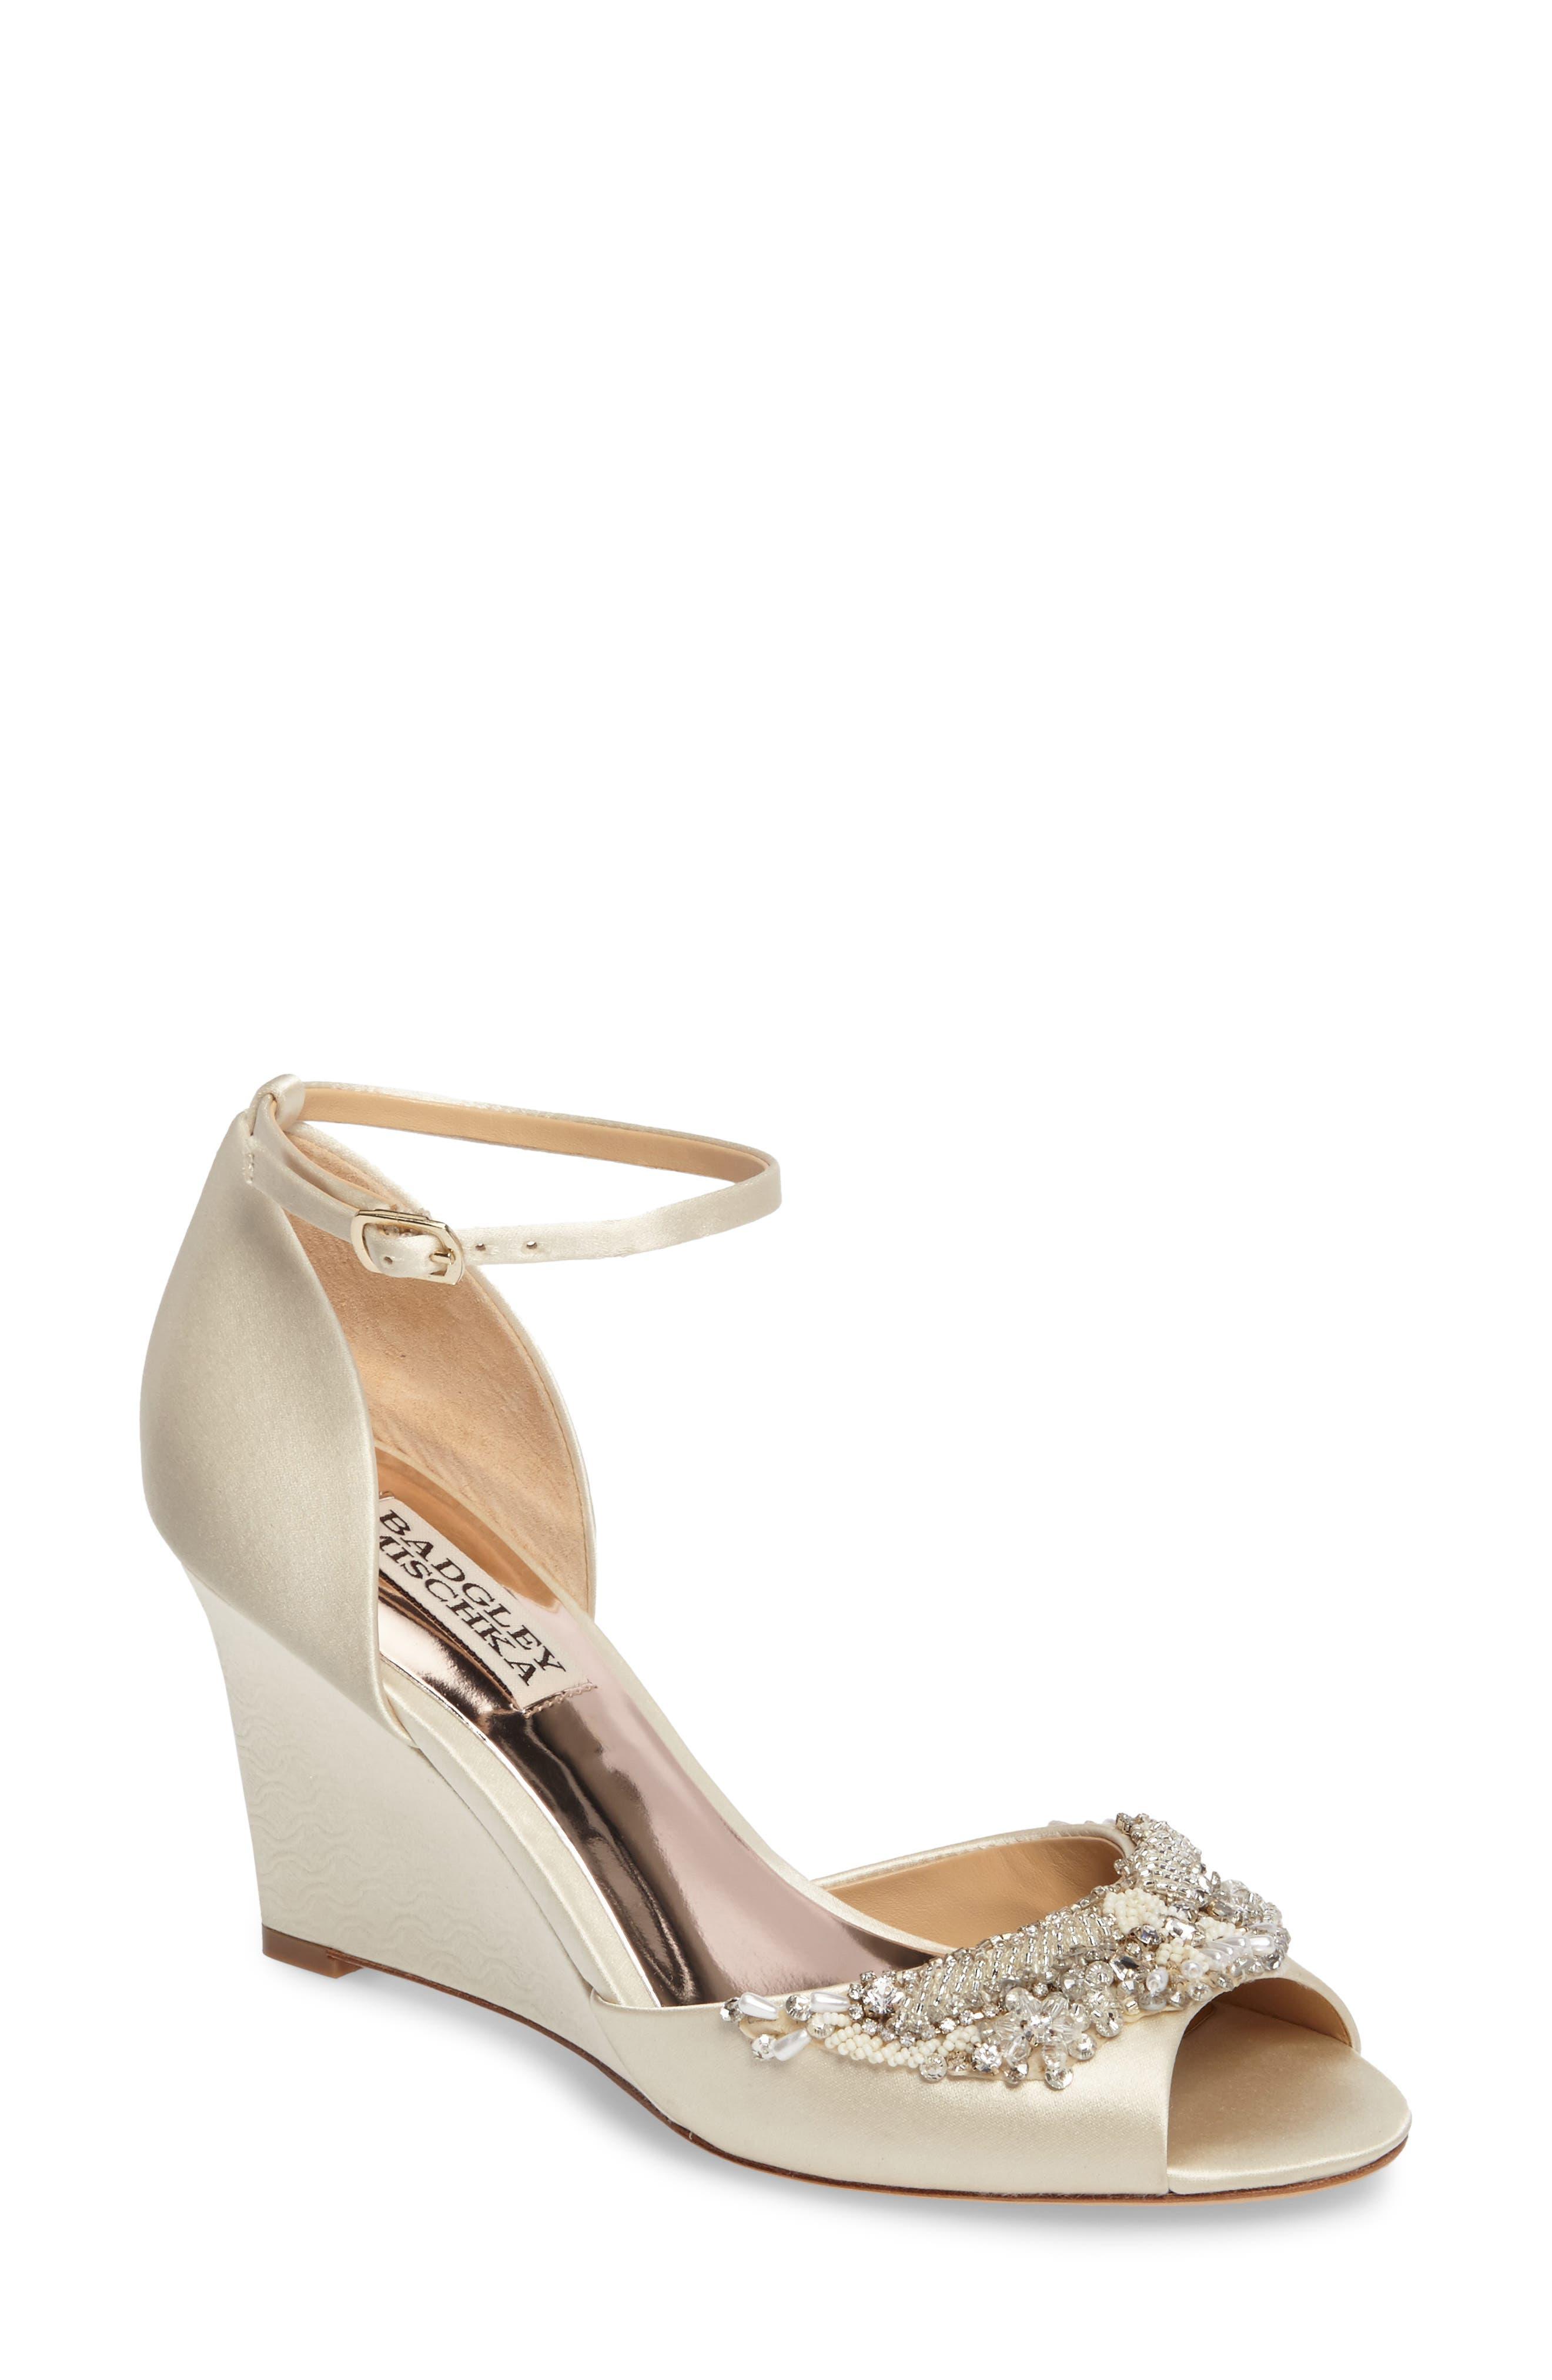 Malorie Embellished Sandal,                             Main thumbnail 2, color,